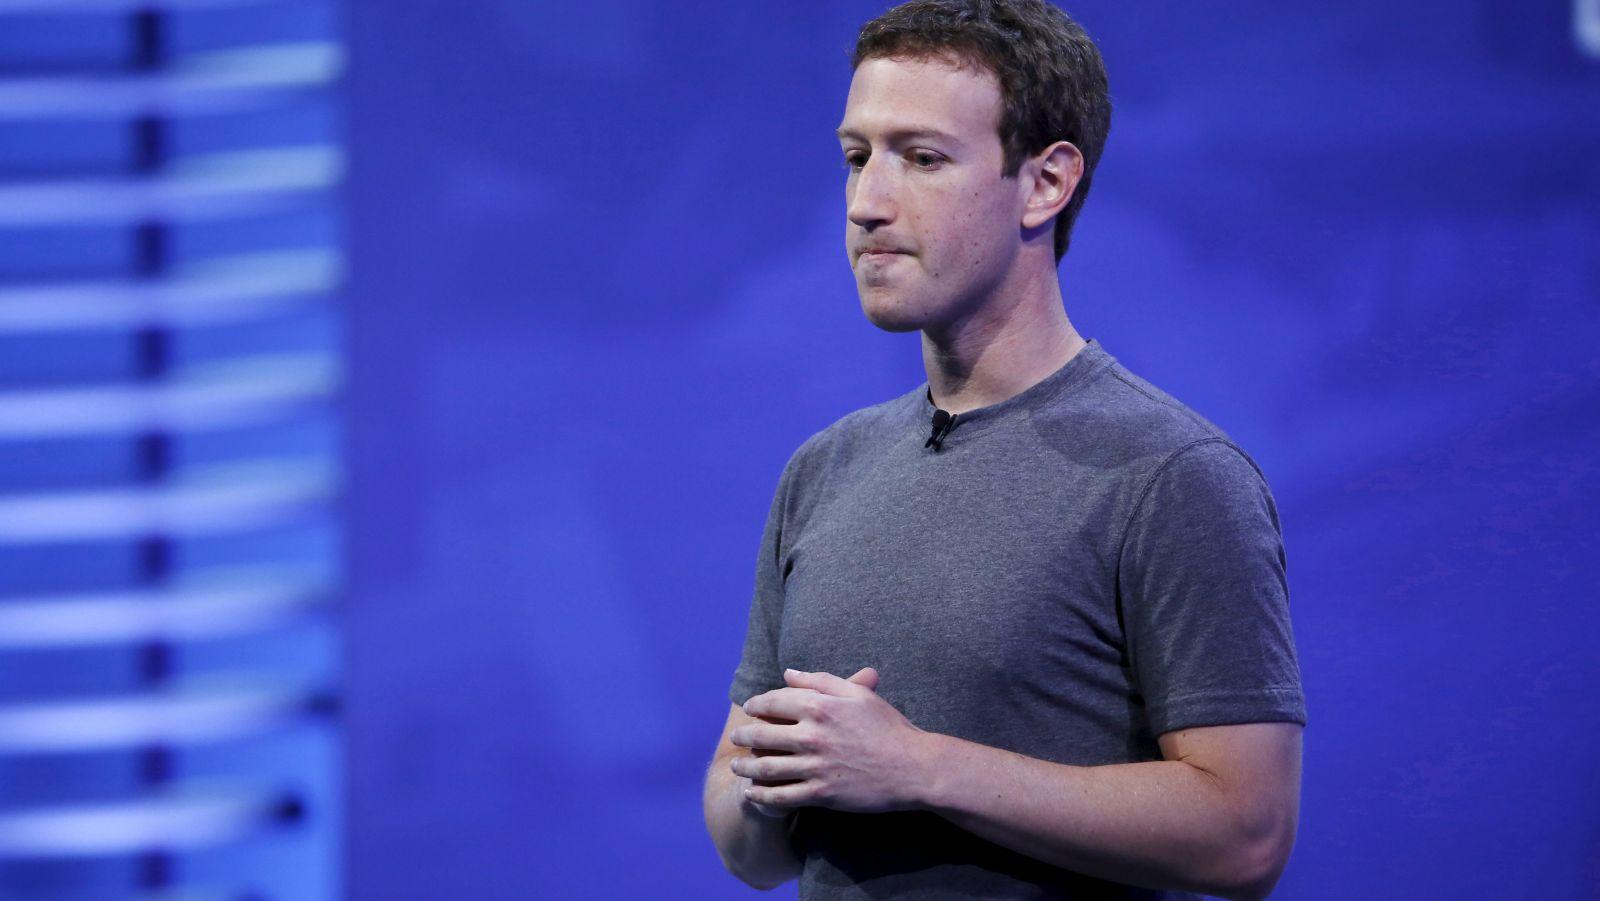 Facebook เผยแฮกเกอร์ได้ข้อมูลผู้ใช้ 30 ล้านราย